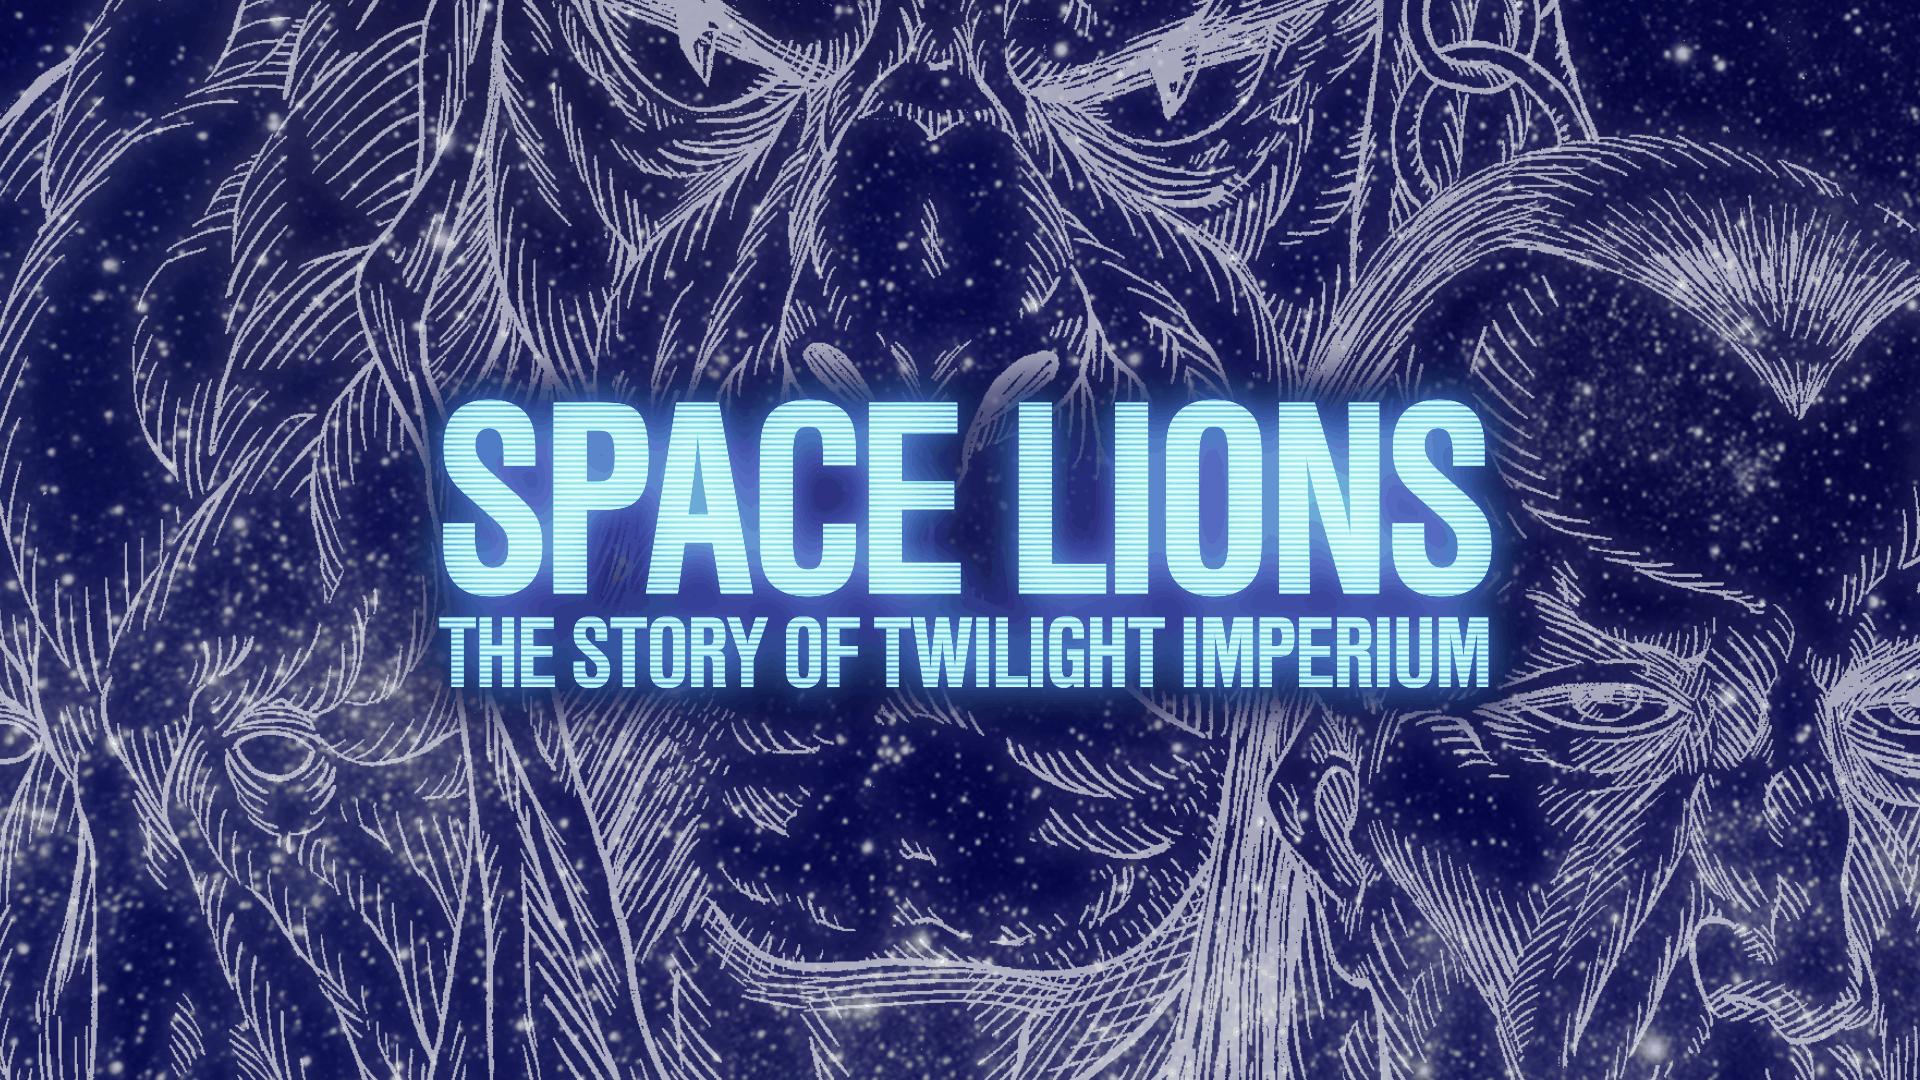 Twilight Imperium 4th edition - Shut Up & Sit Down